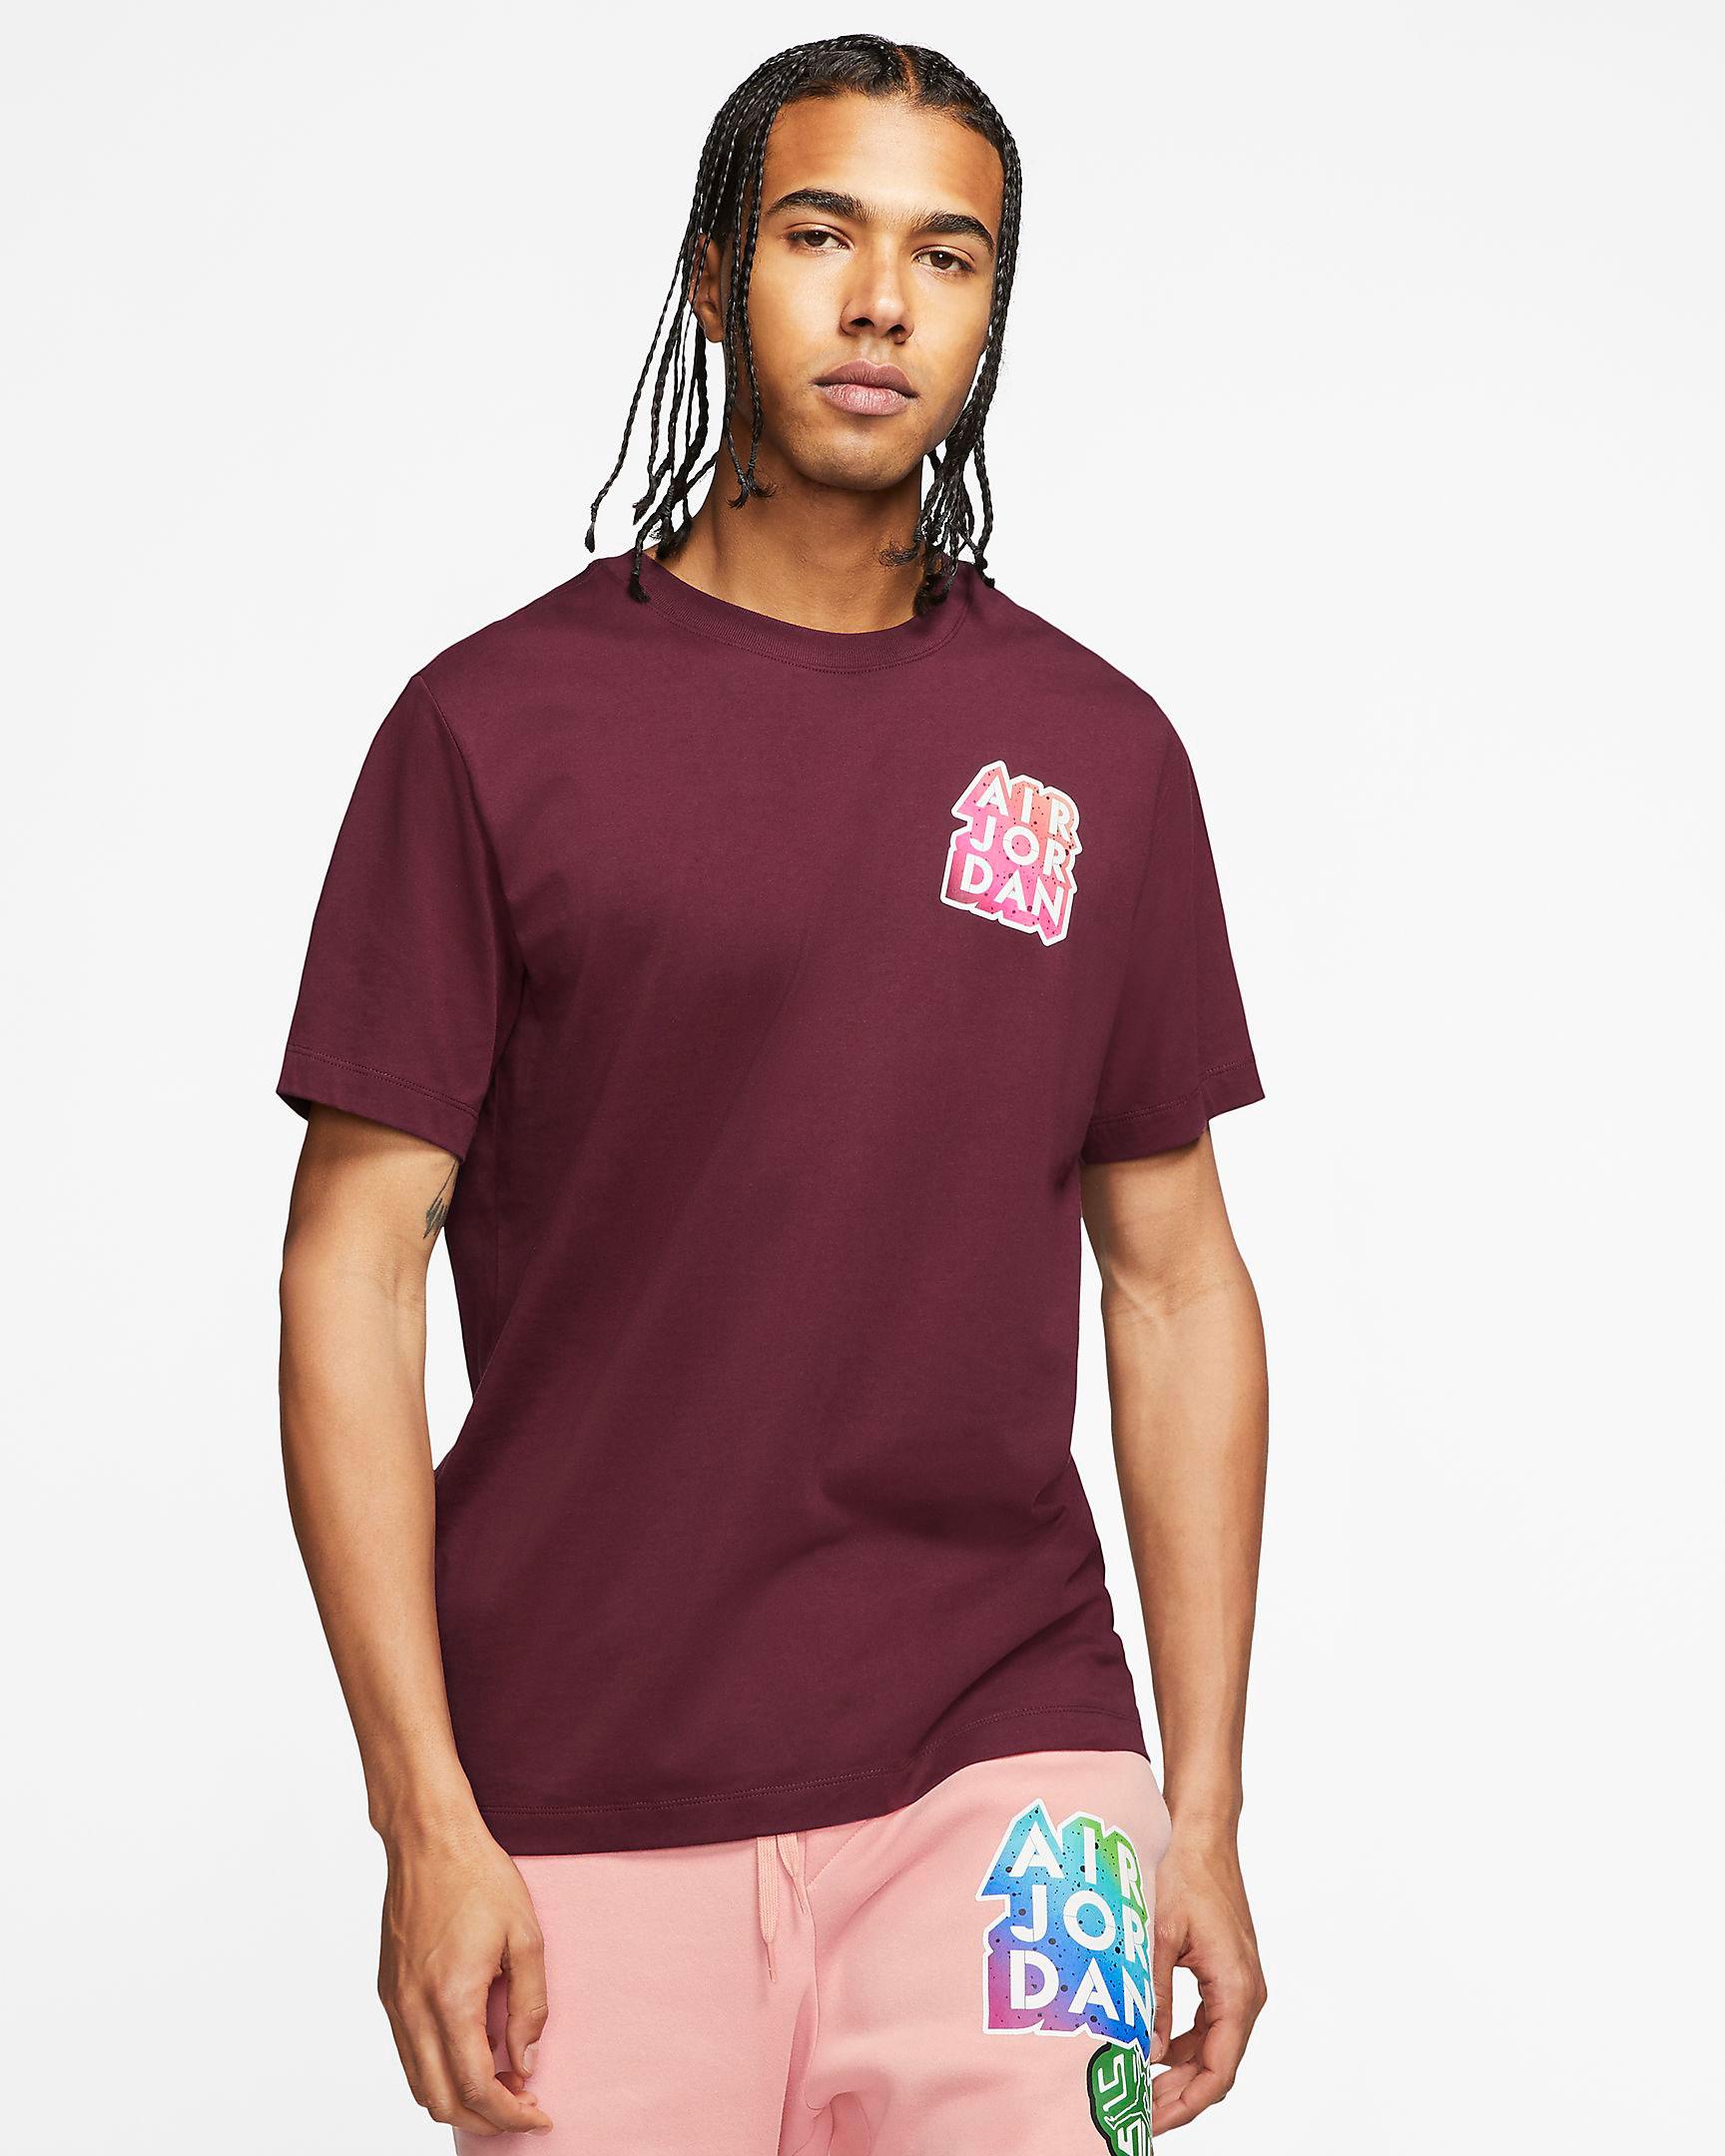 jordan-sticker-shirt-burgundy-1